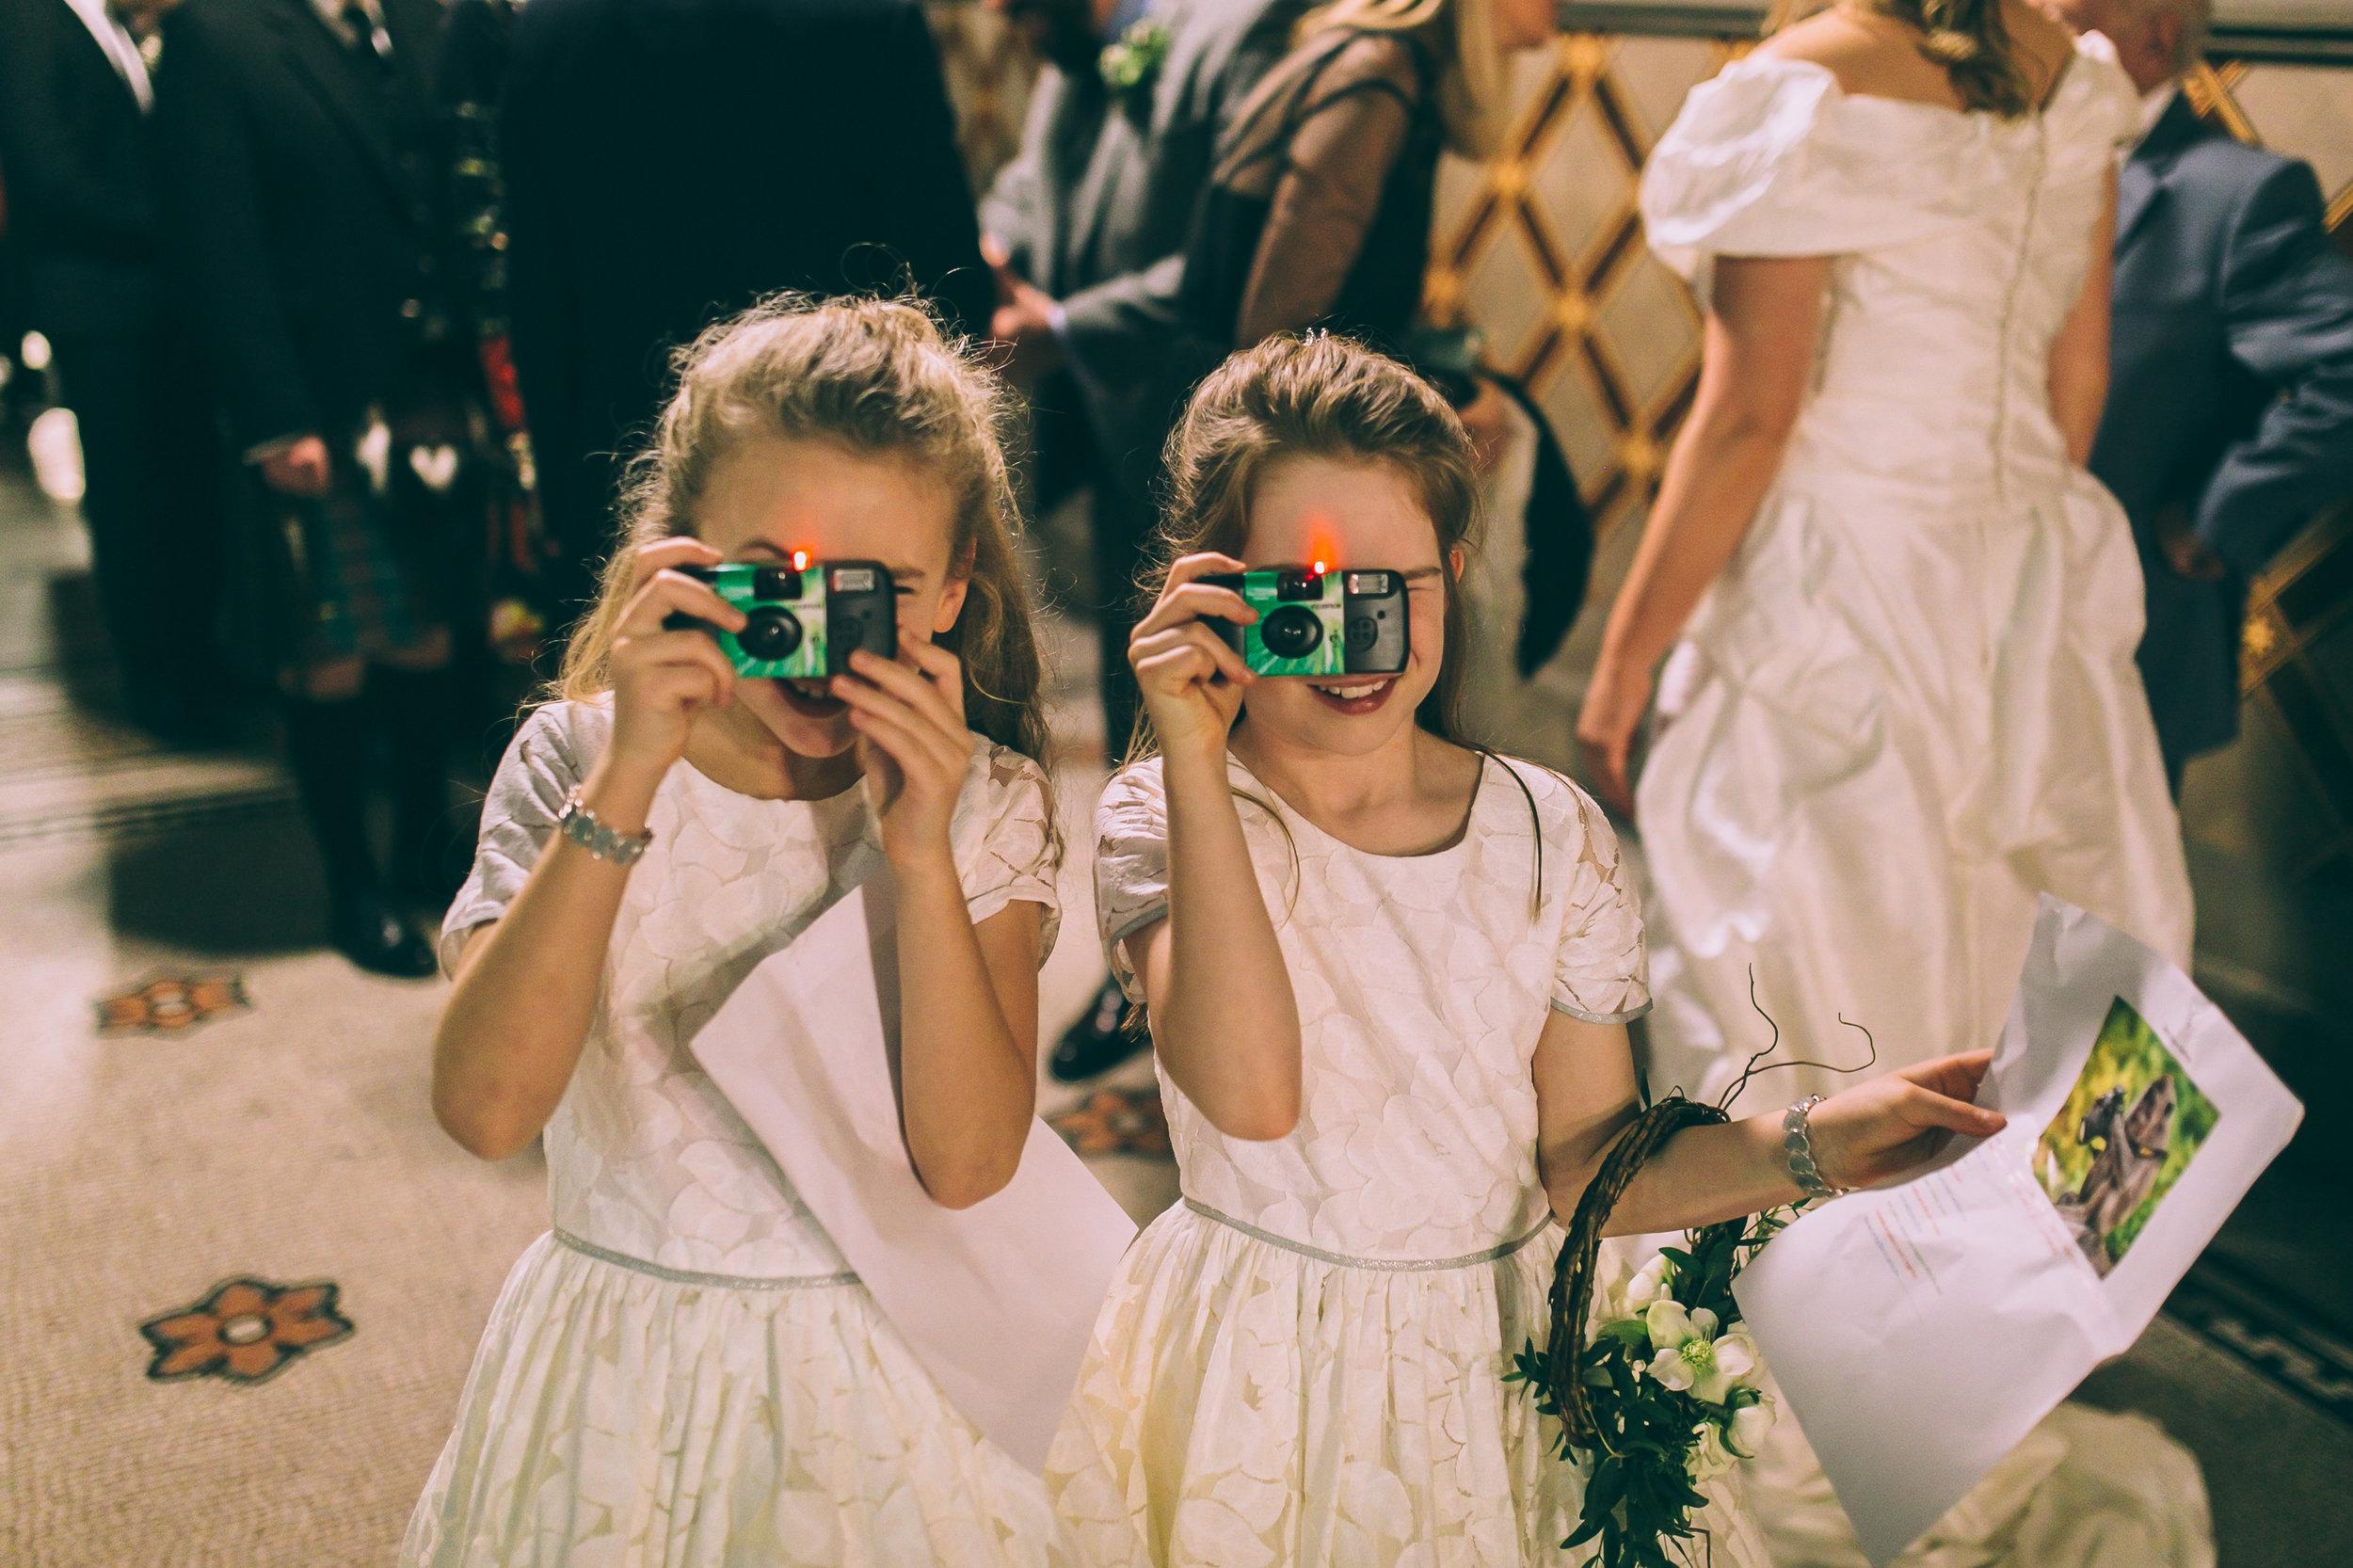 Kate&Tony-Wedding-at-Manchester-town-hall--Cheadle-tom-biddle-tb237.jpg